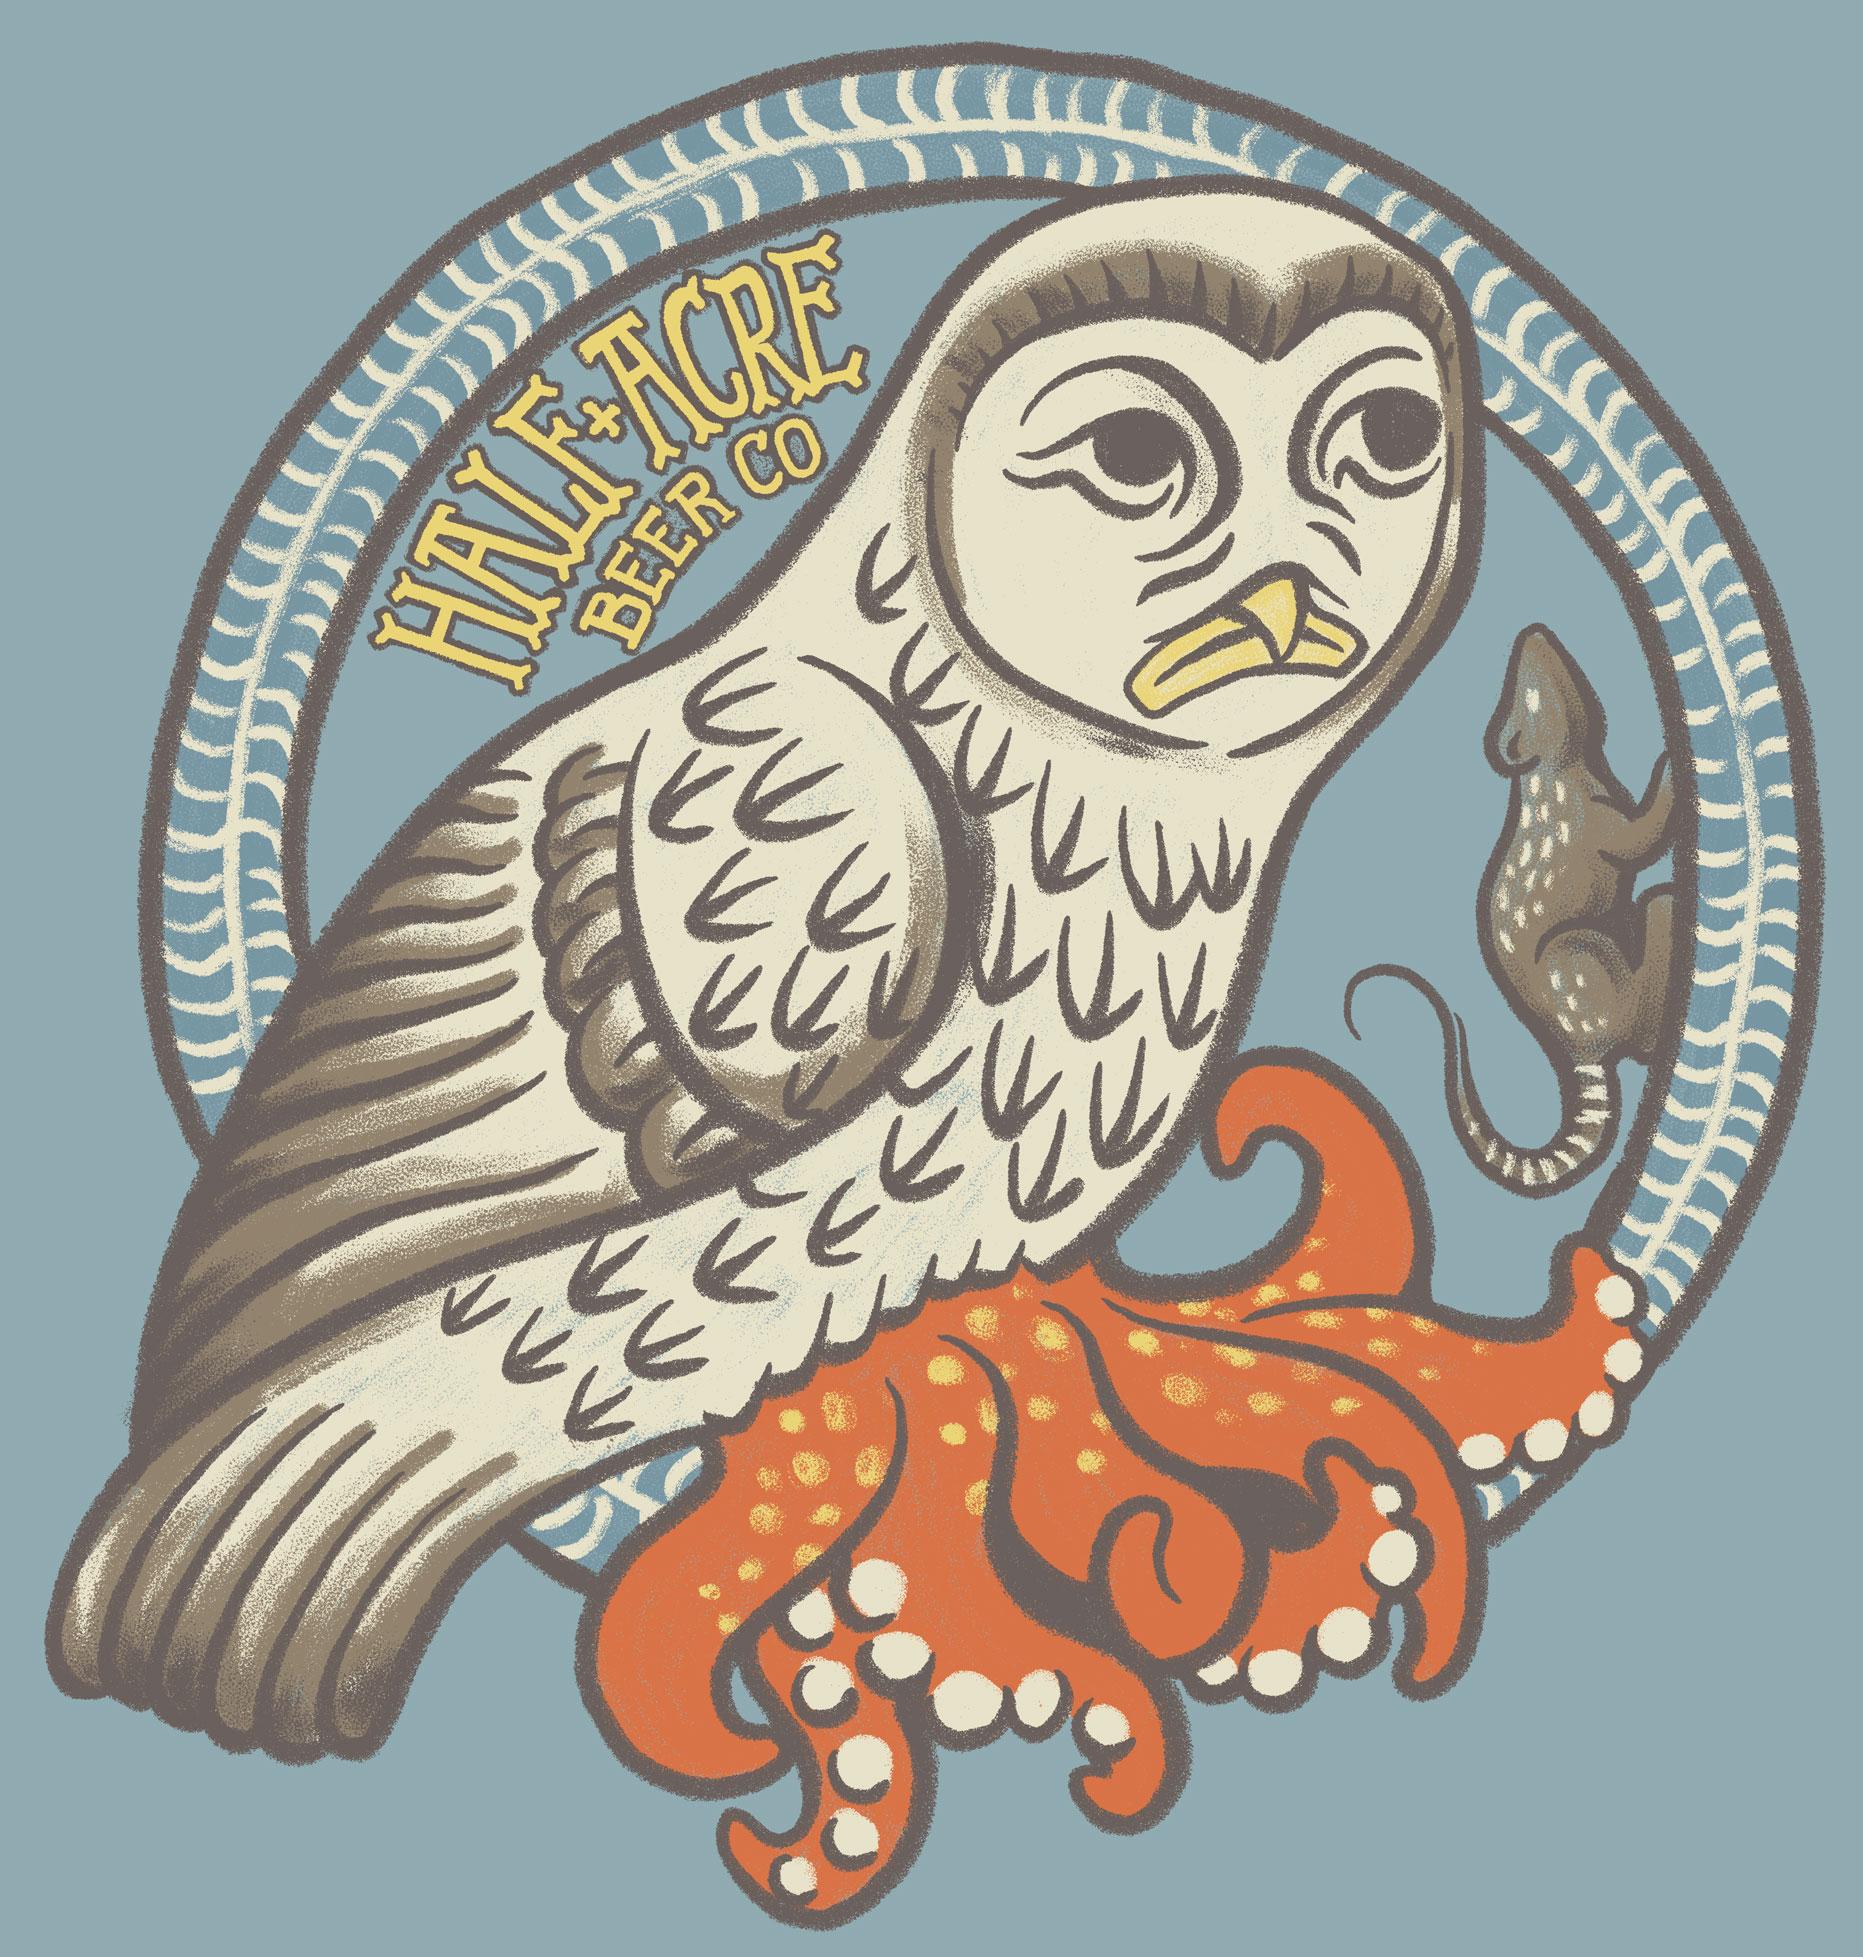 Medieval Squidowl Shirt